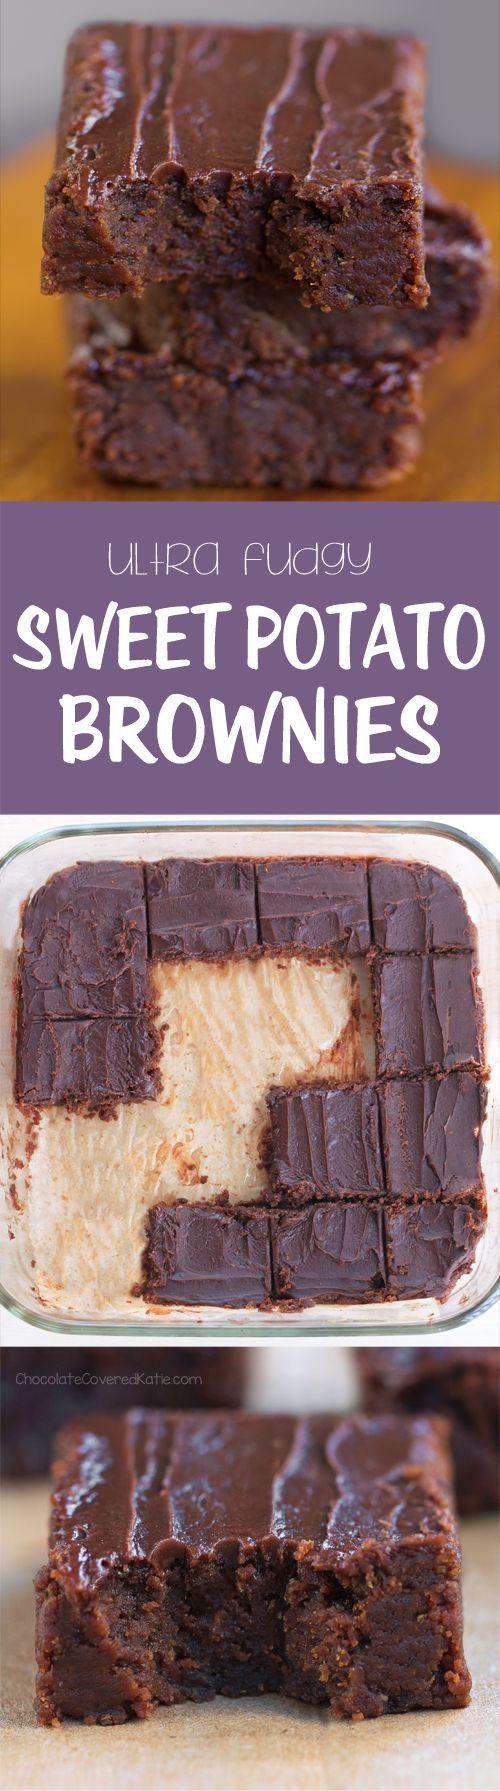 Ingredientes: 1 patata grande dulce, cacao en polvo 1/2 taza, 3 cucharadas de ... receta completa: @choccoveredkt chocolatecoveredkatie.com/2016/10/13/sweet-potato-brownies-recipe/